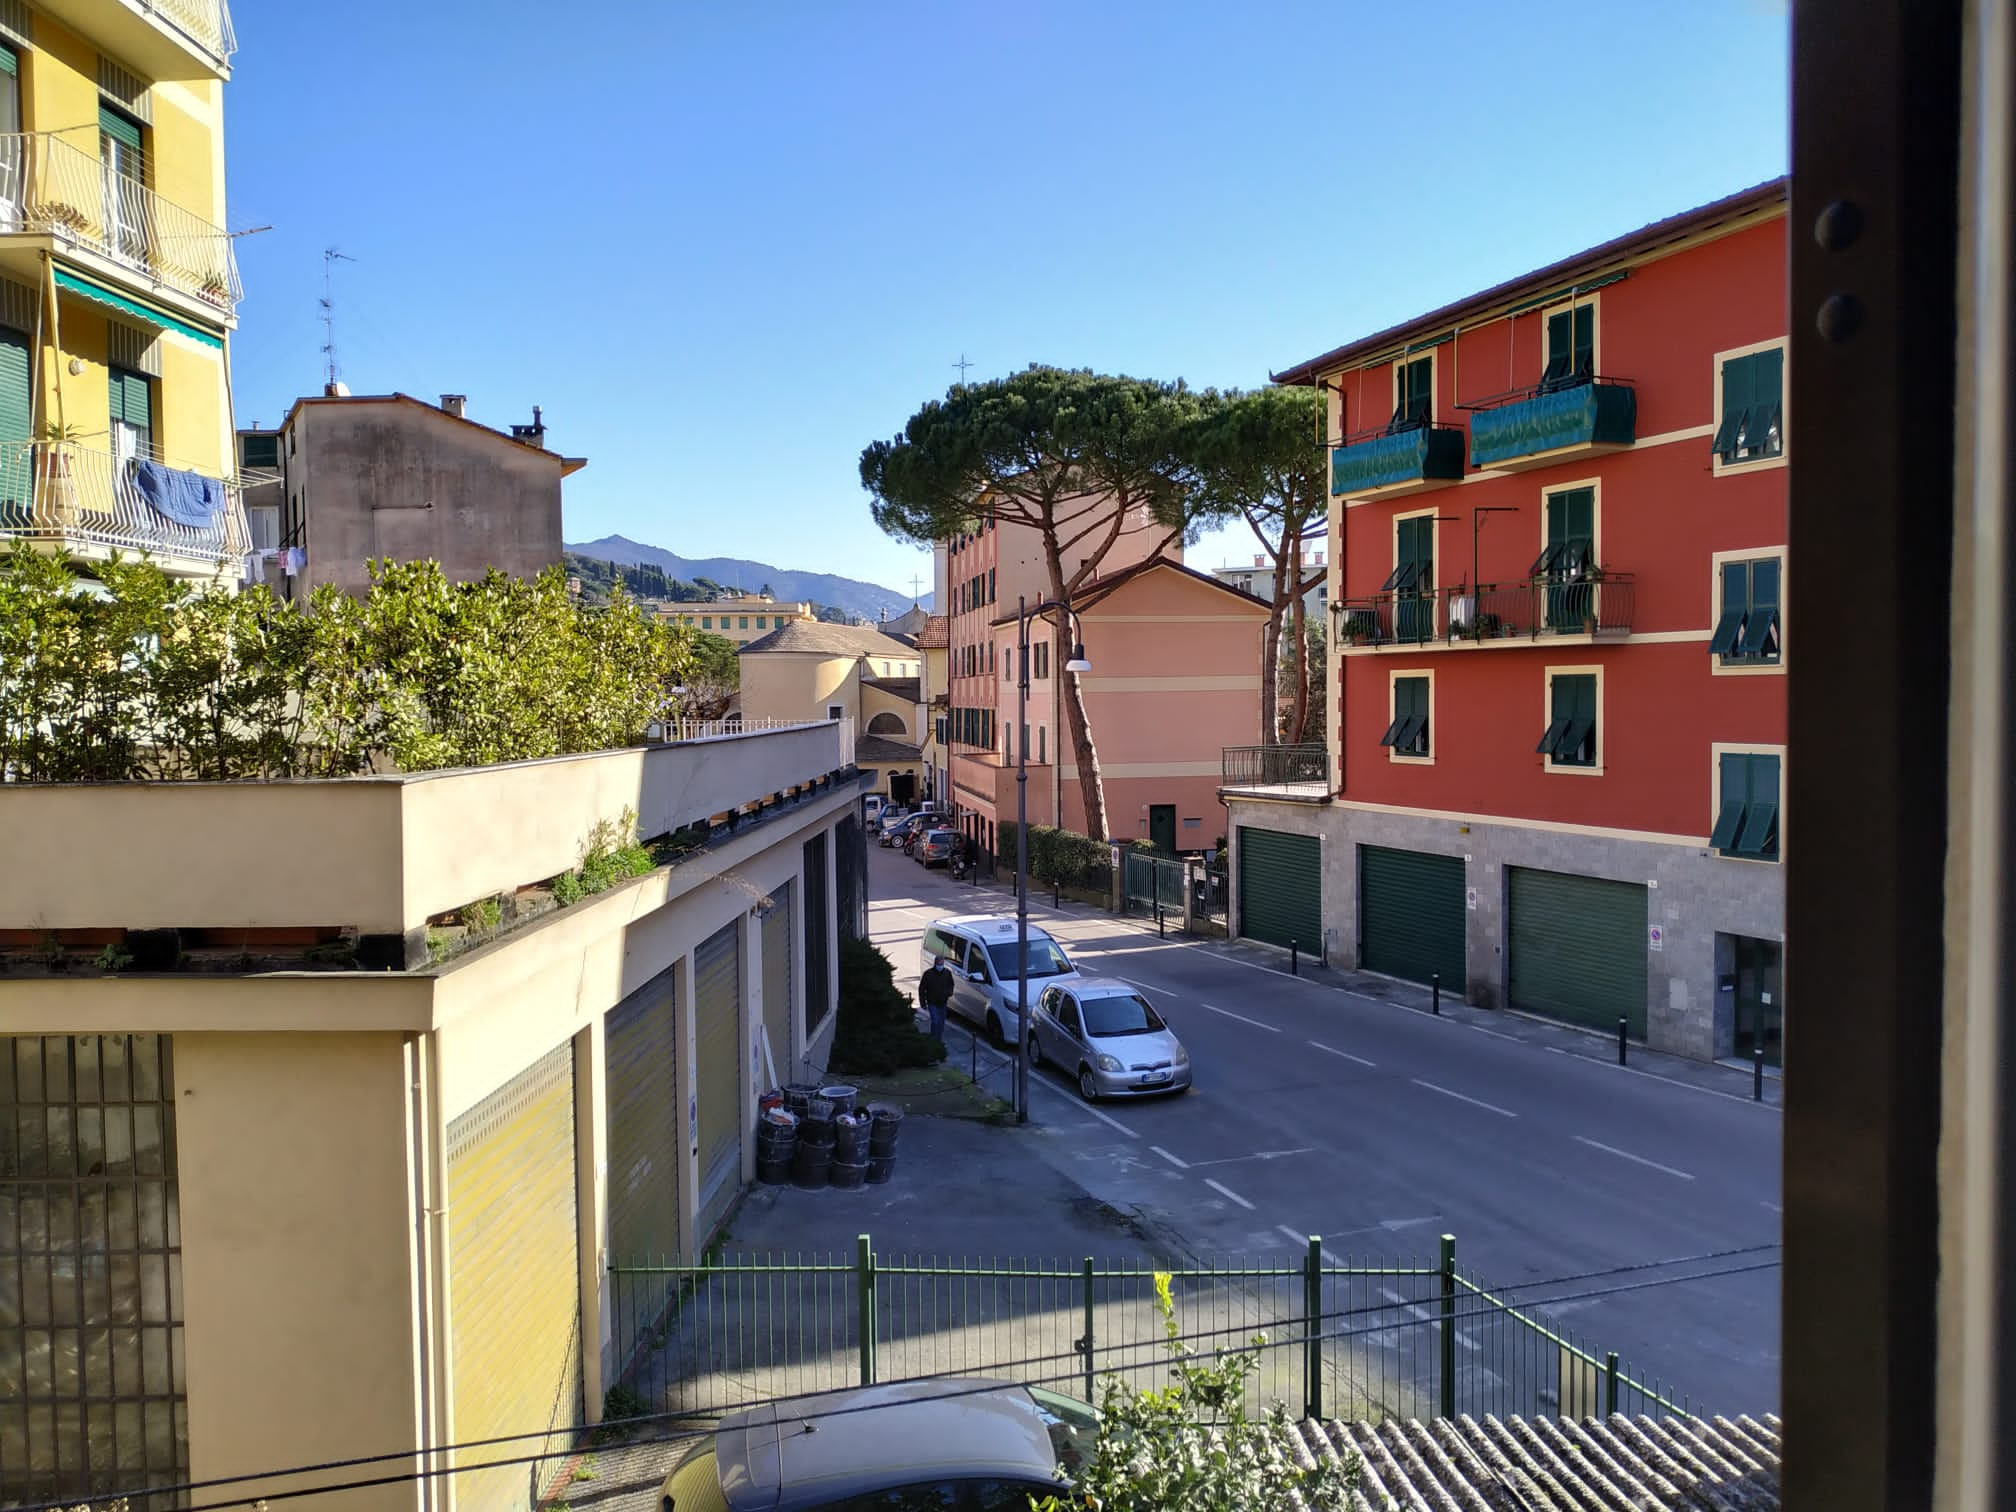 Vendita appartamenti in casa bifamigliare Santa Margherita Ligure